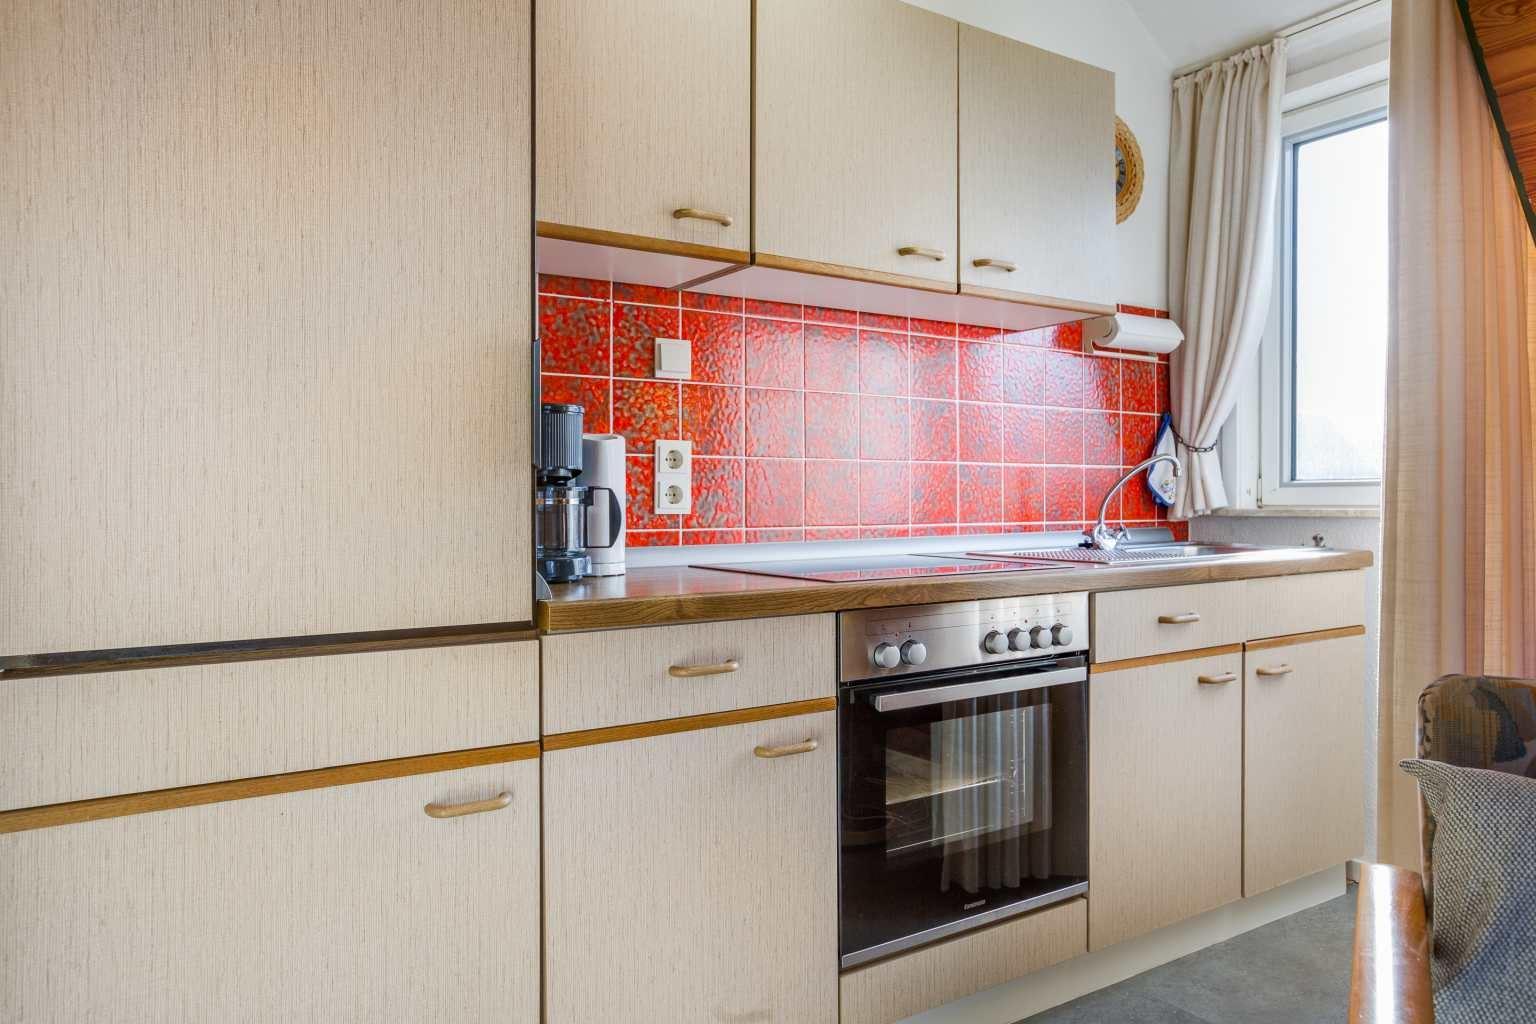 Küche - Haus Hildegard, Wohnung OG links, Friedrich-Hebbel-Straße 11, St. Peter-Bad, SPO